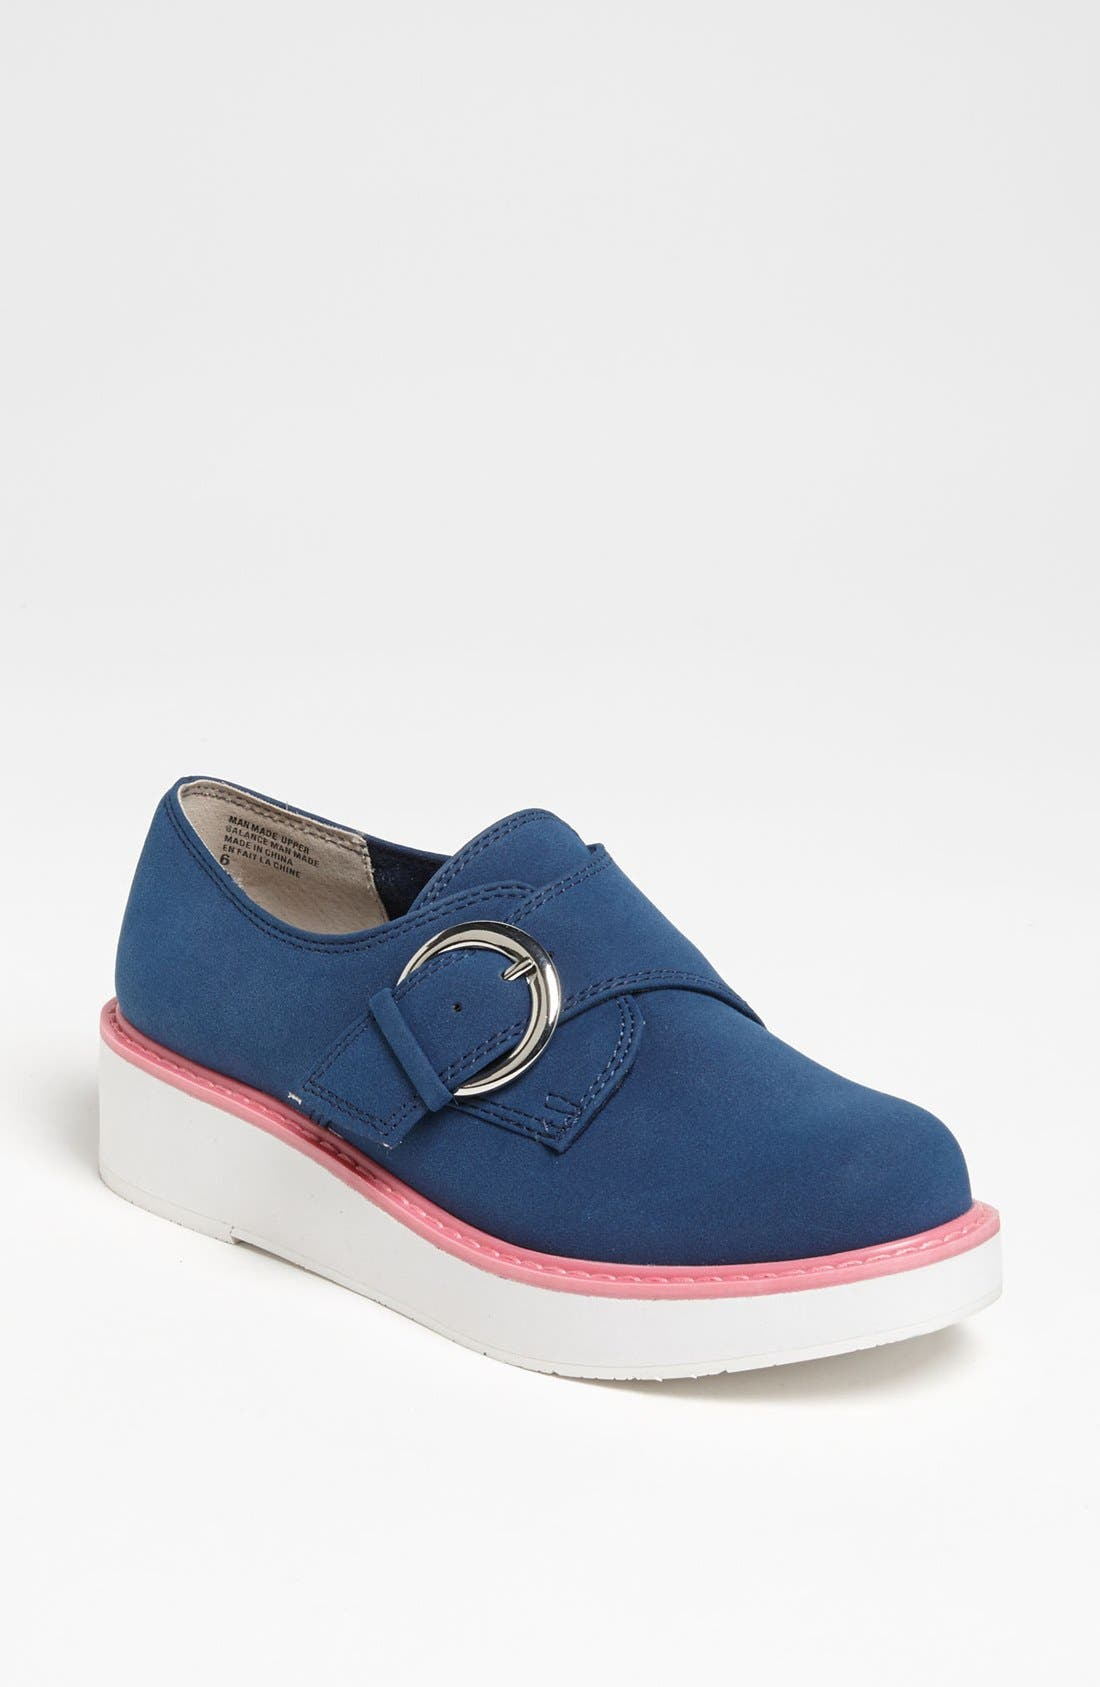 Alternate Image 1 Selected - BC Footwear 'Higher Education' Flat